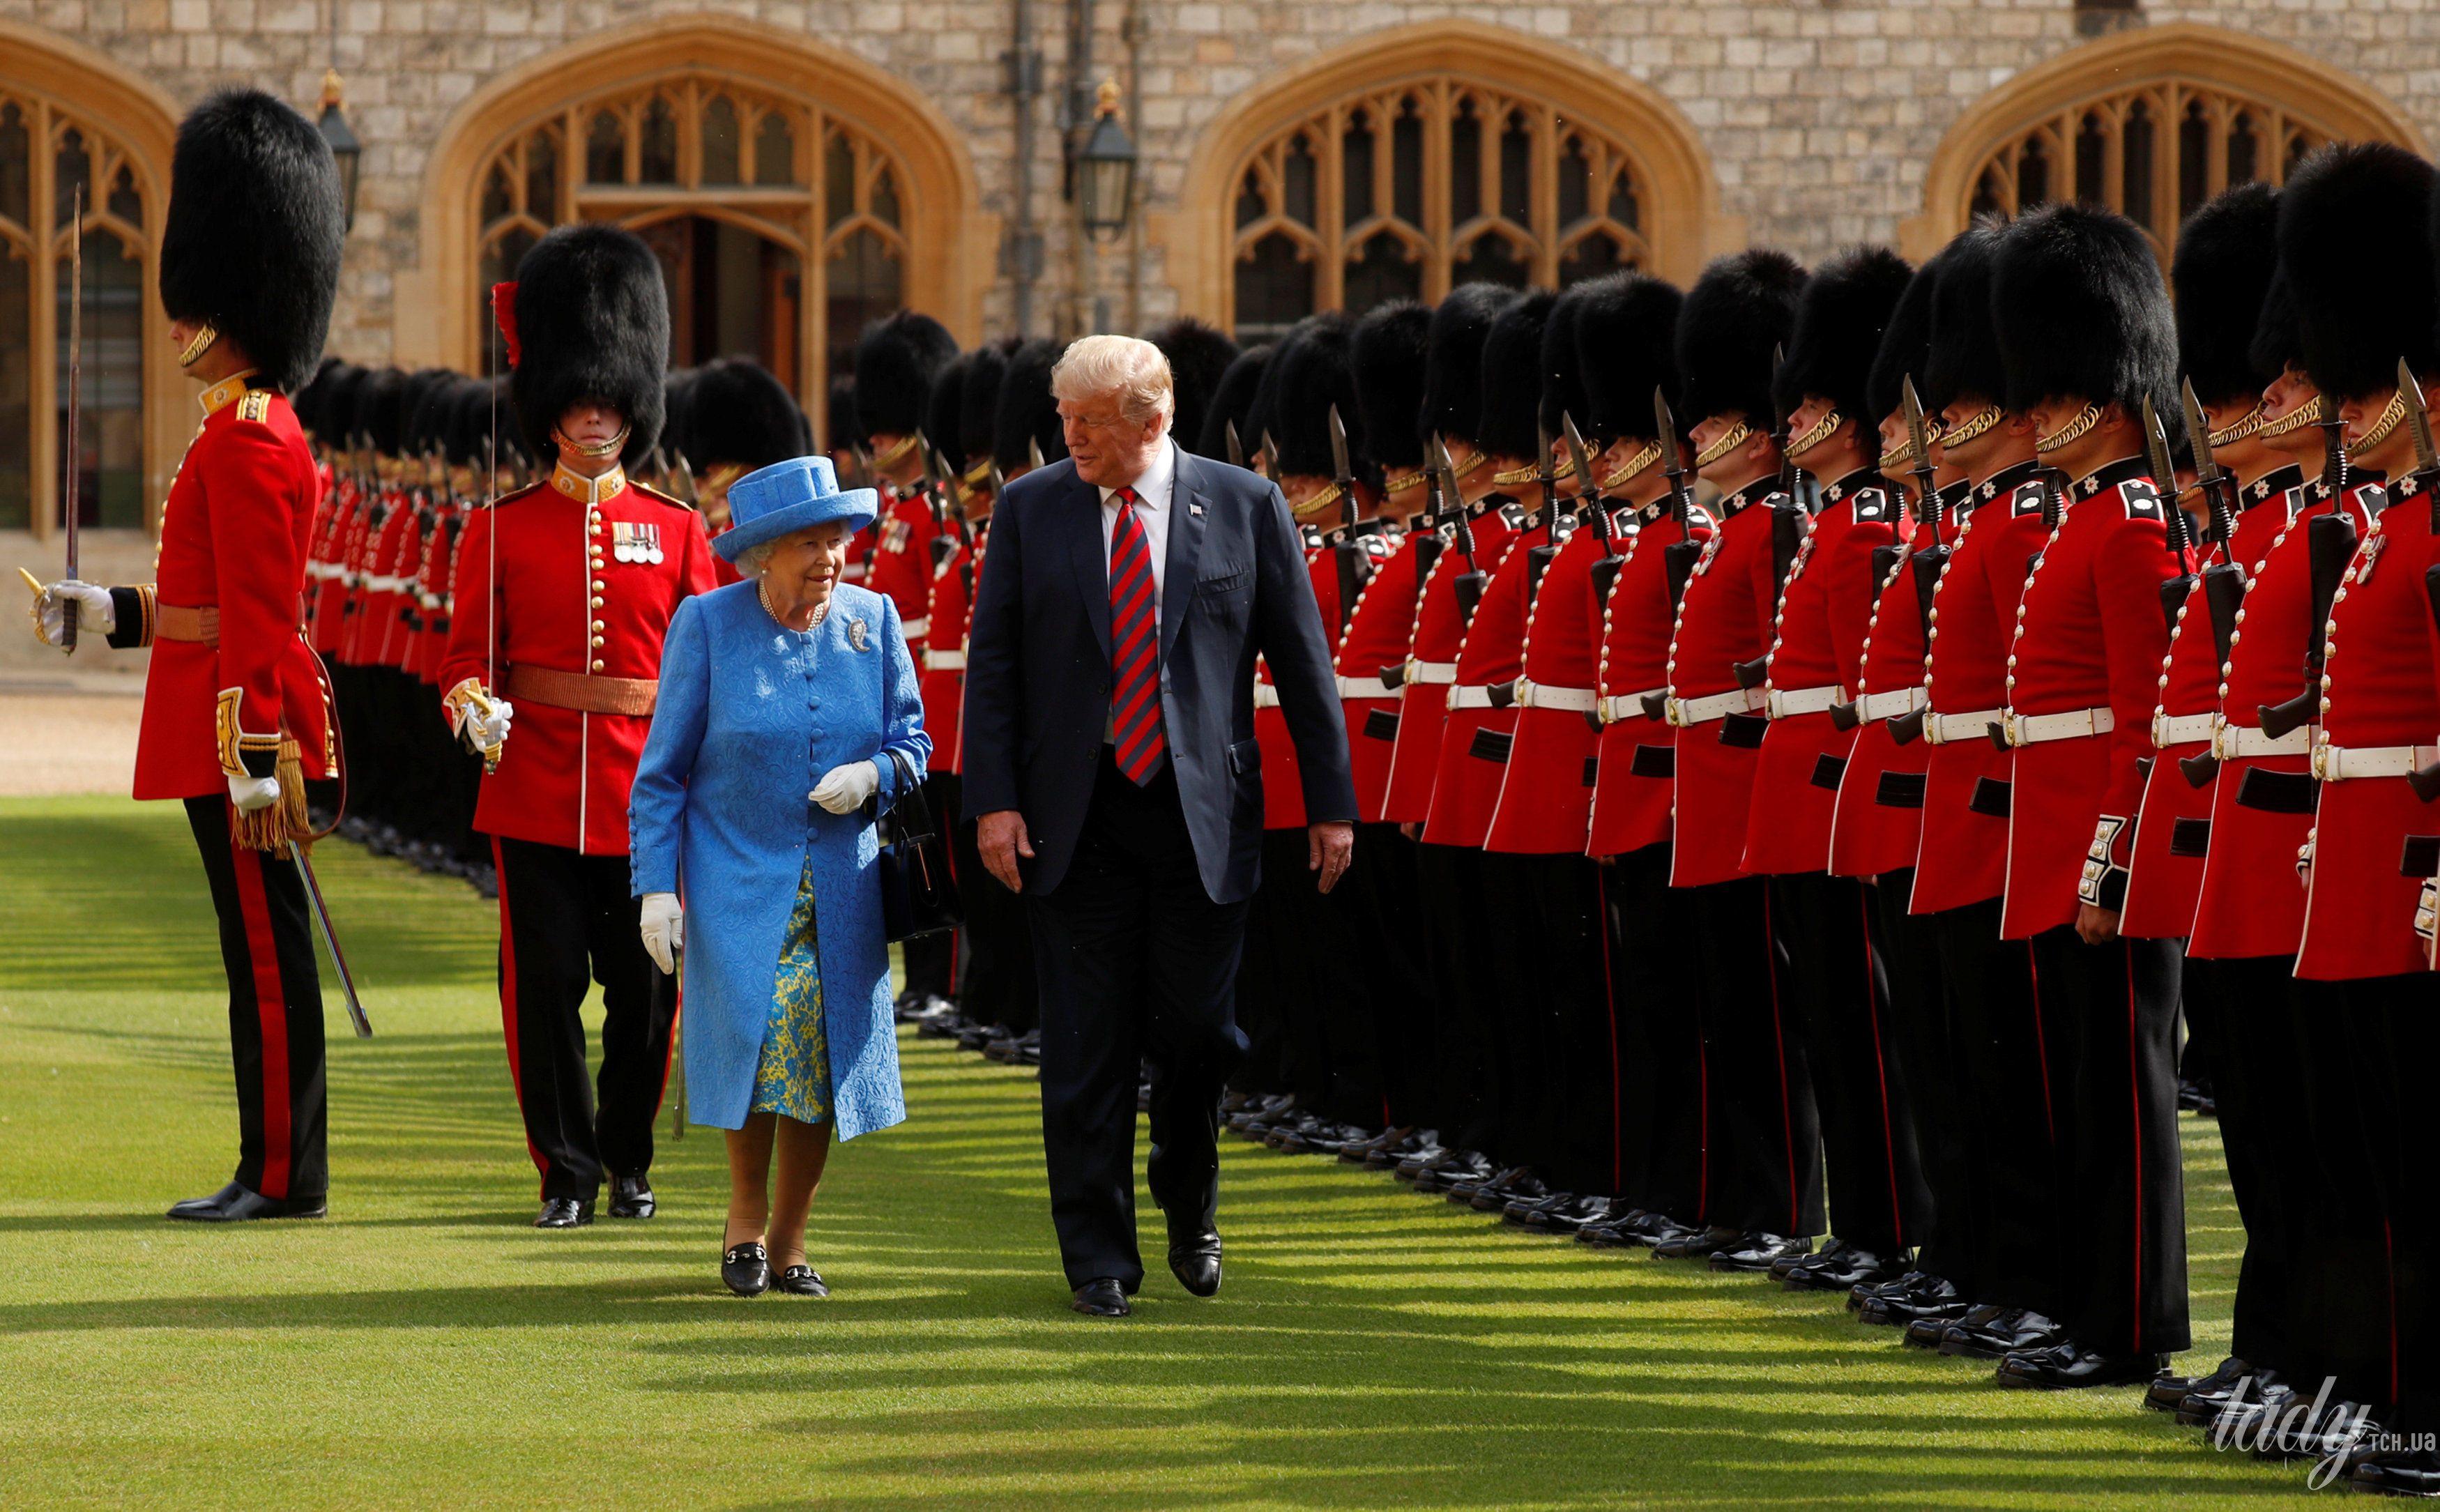 Королева Елизавета II, Мелания Трамп и Дональд Трамп_8